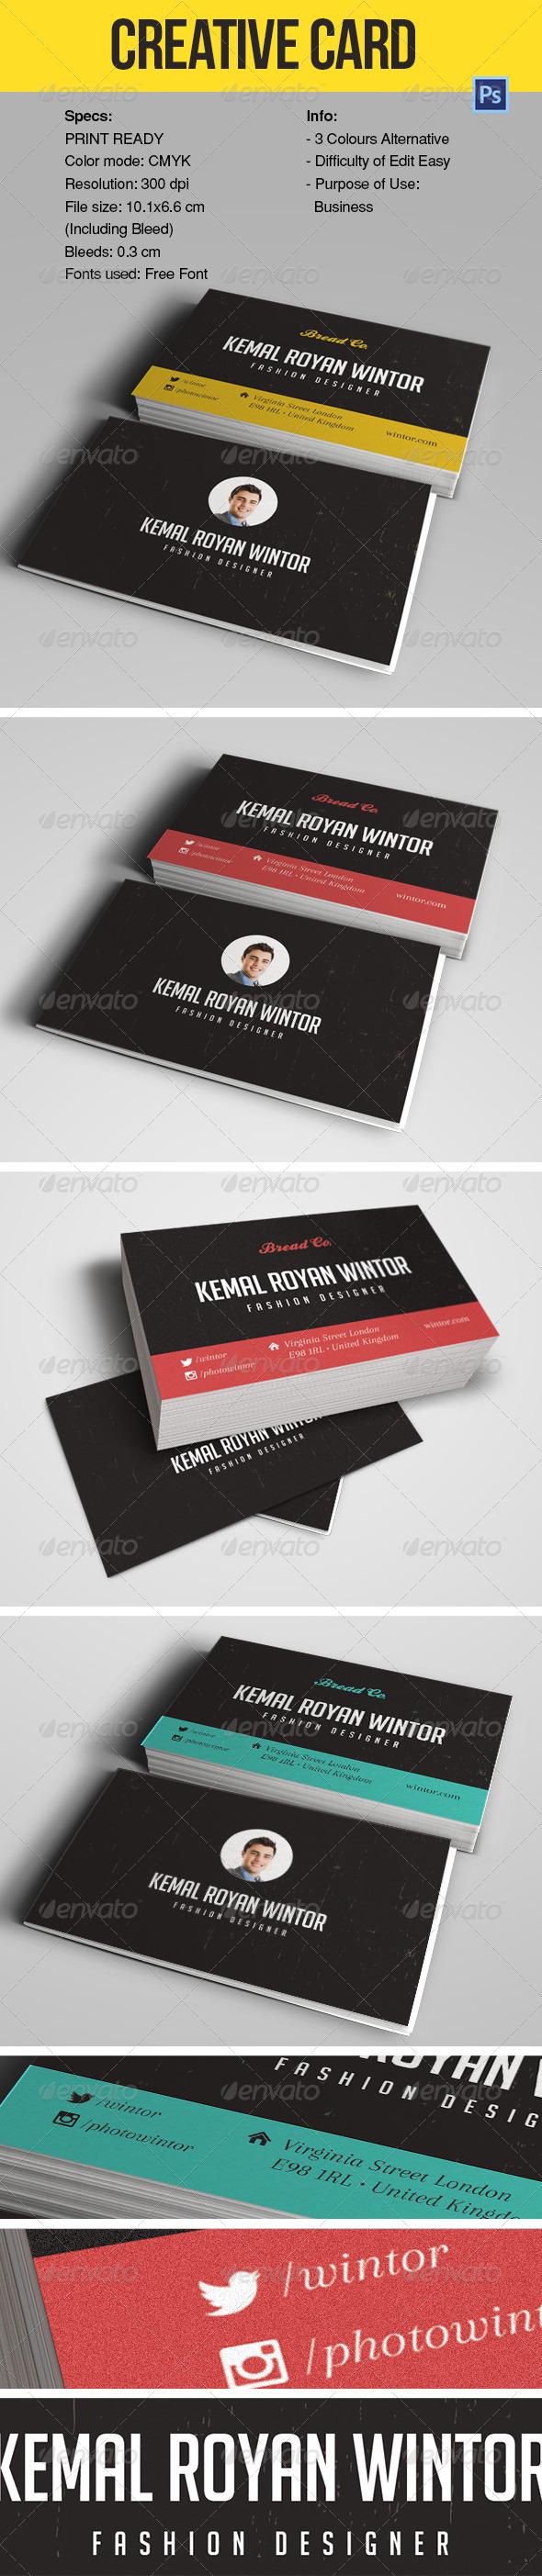 CREATIVE BUSINESS CARD YMC DESIGN - Creative Business Cards